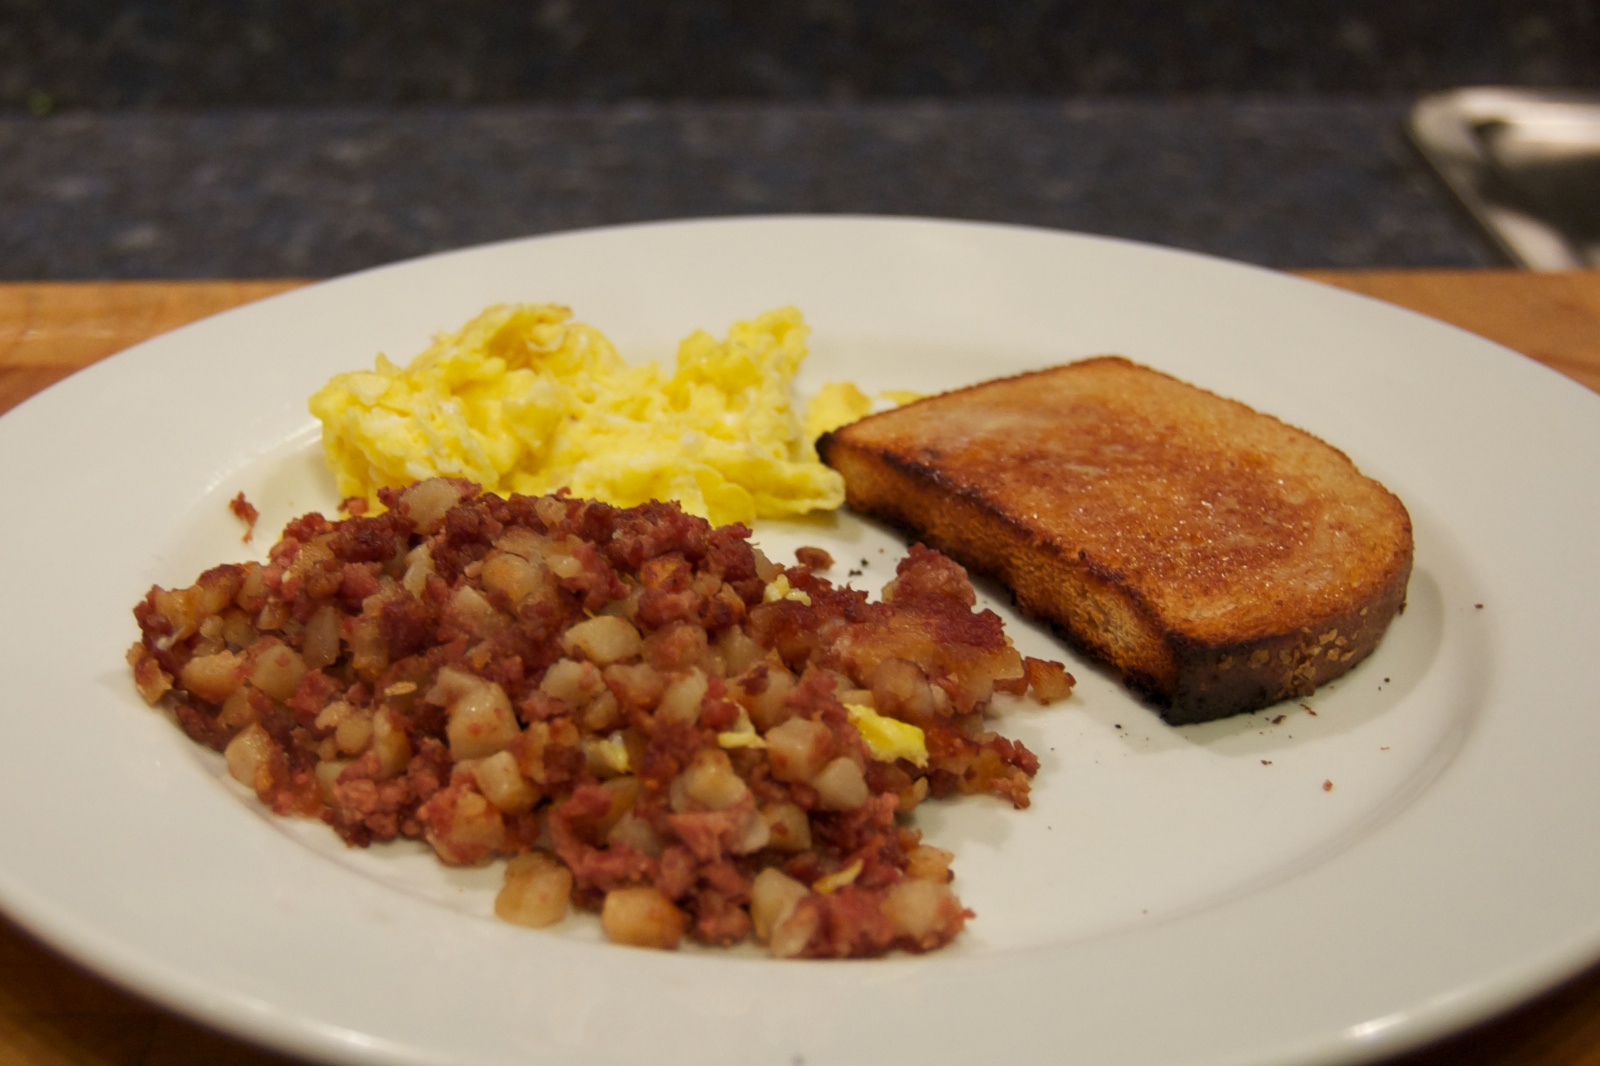 http://blog.rickk.com/food/2012/01/27/ate.2012.01.27.b.jpg